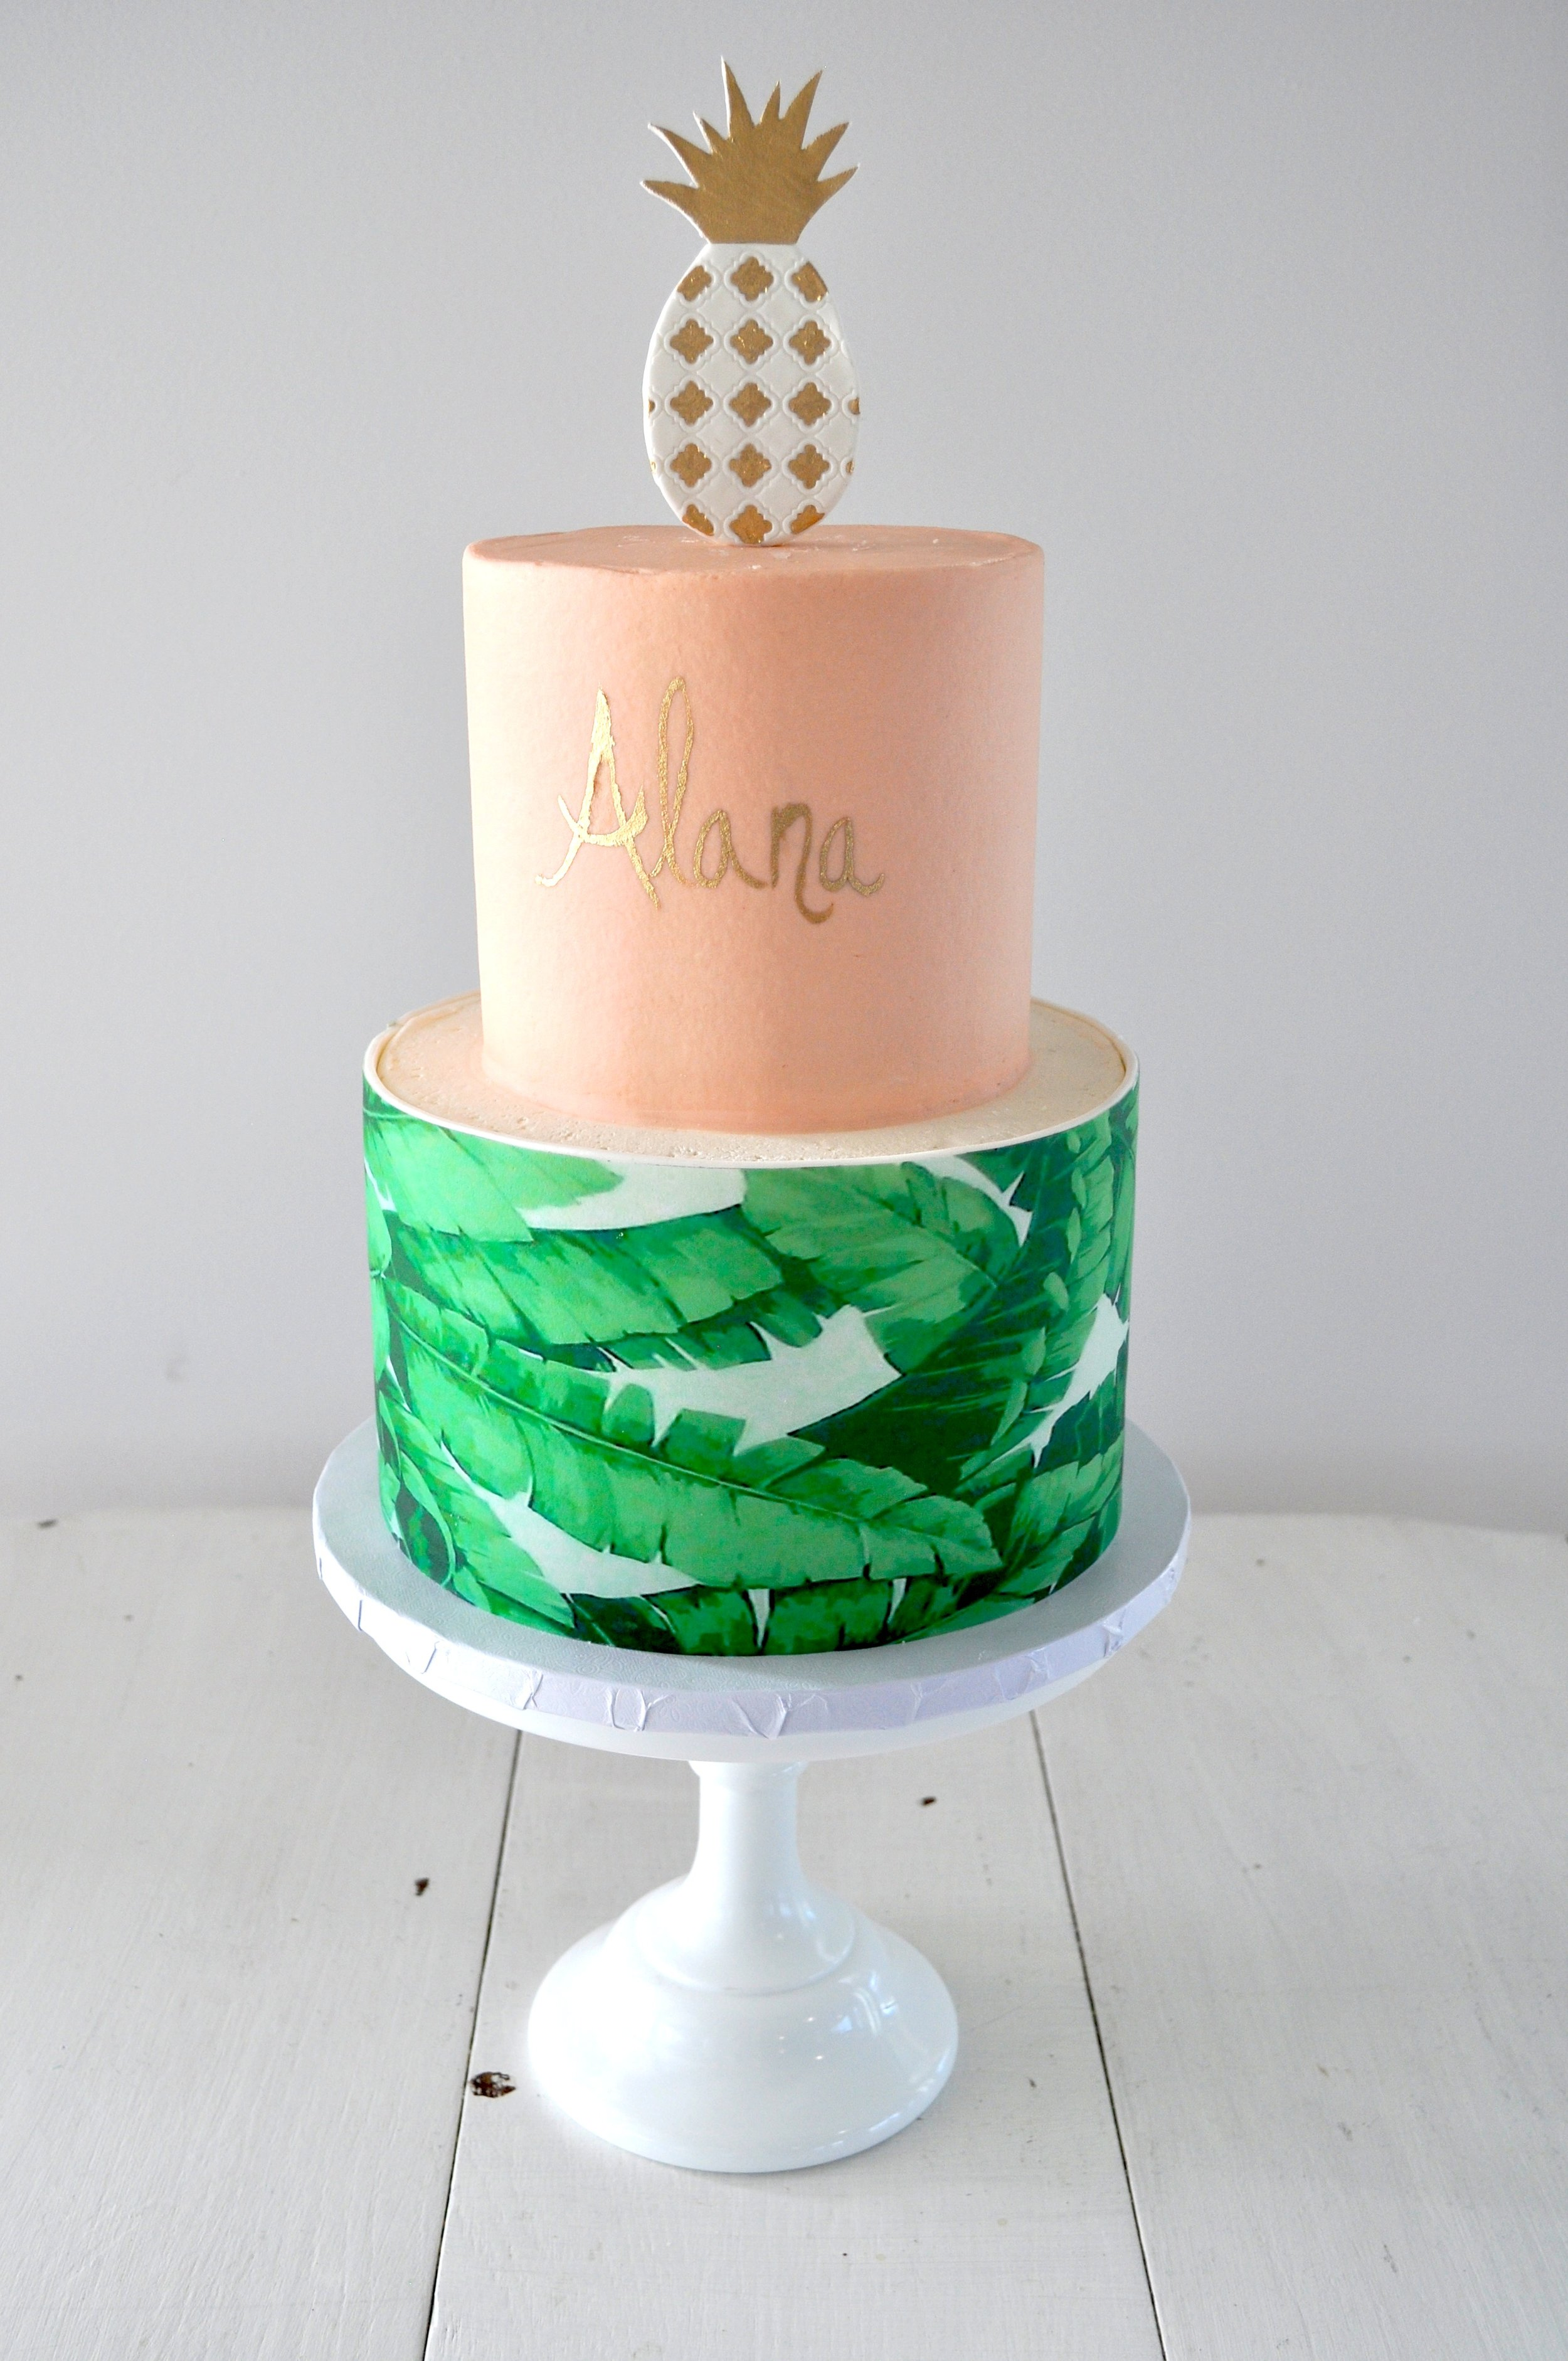 custom-cake-pineapple-palmfrond-sugarbeesweets.jpg